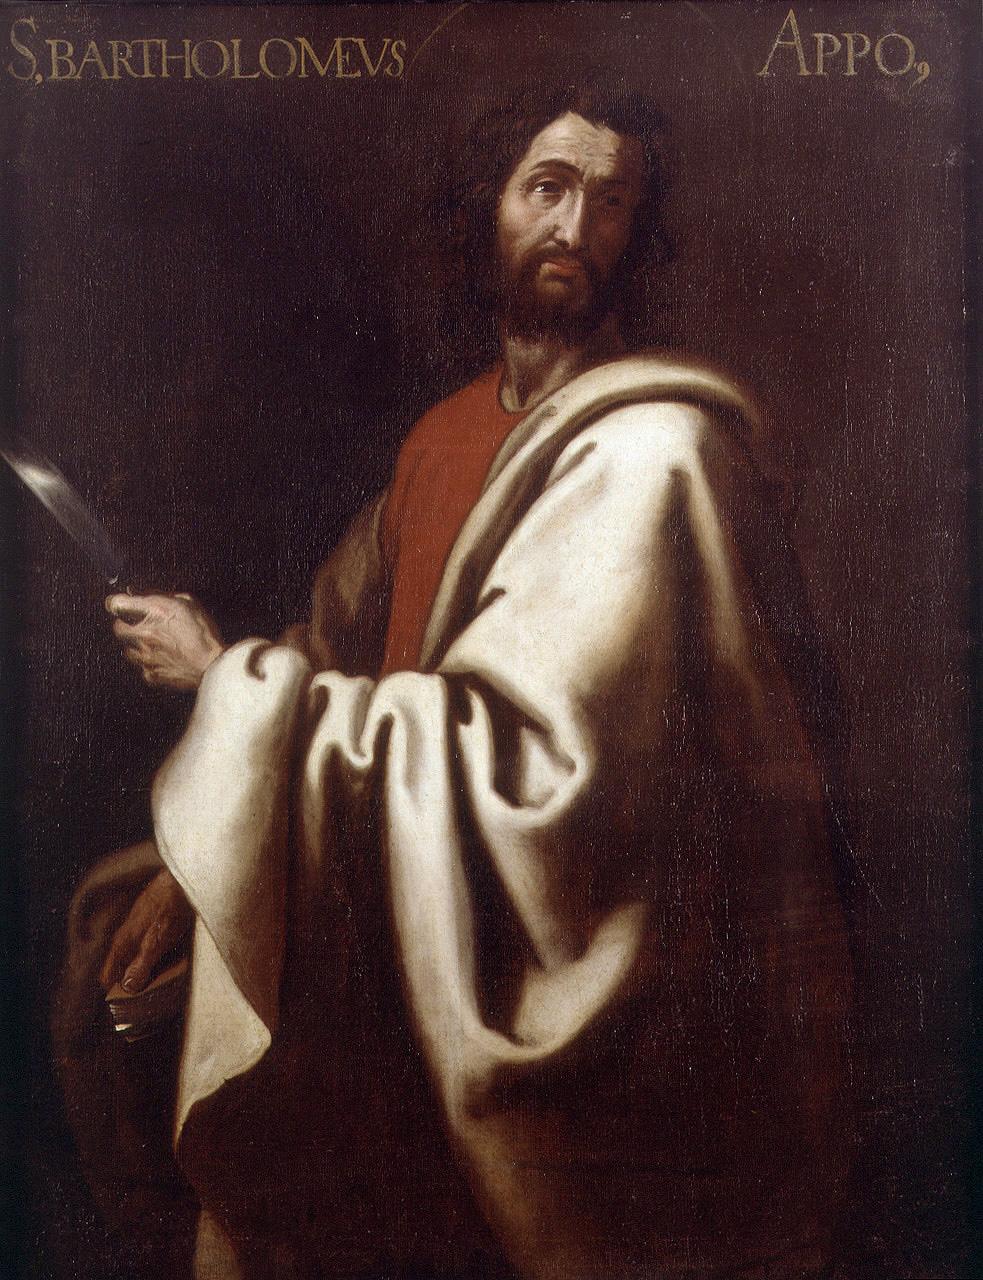 San Bartolomé Apóstol - 24 de agosto 2